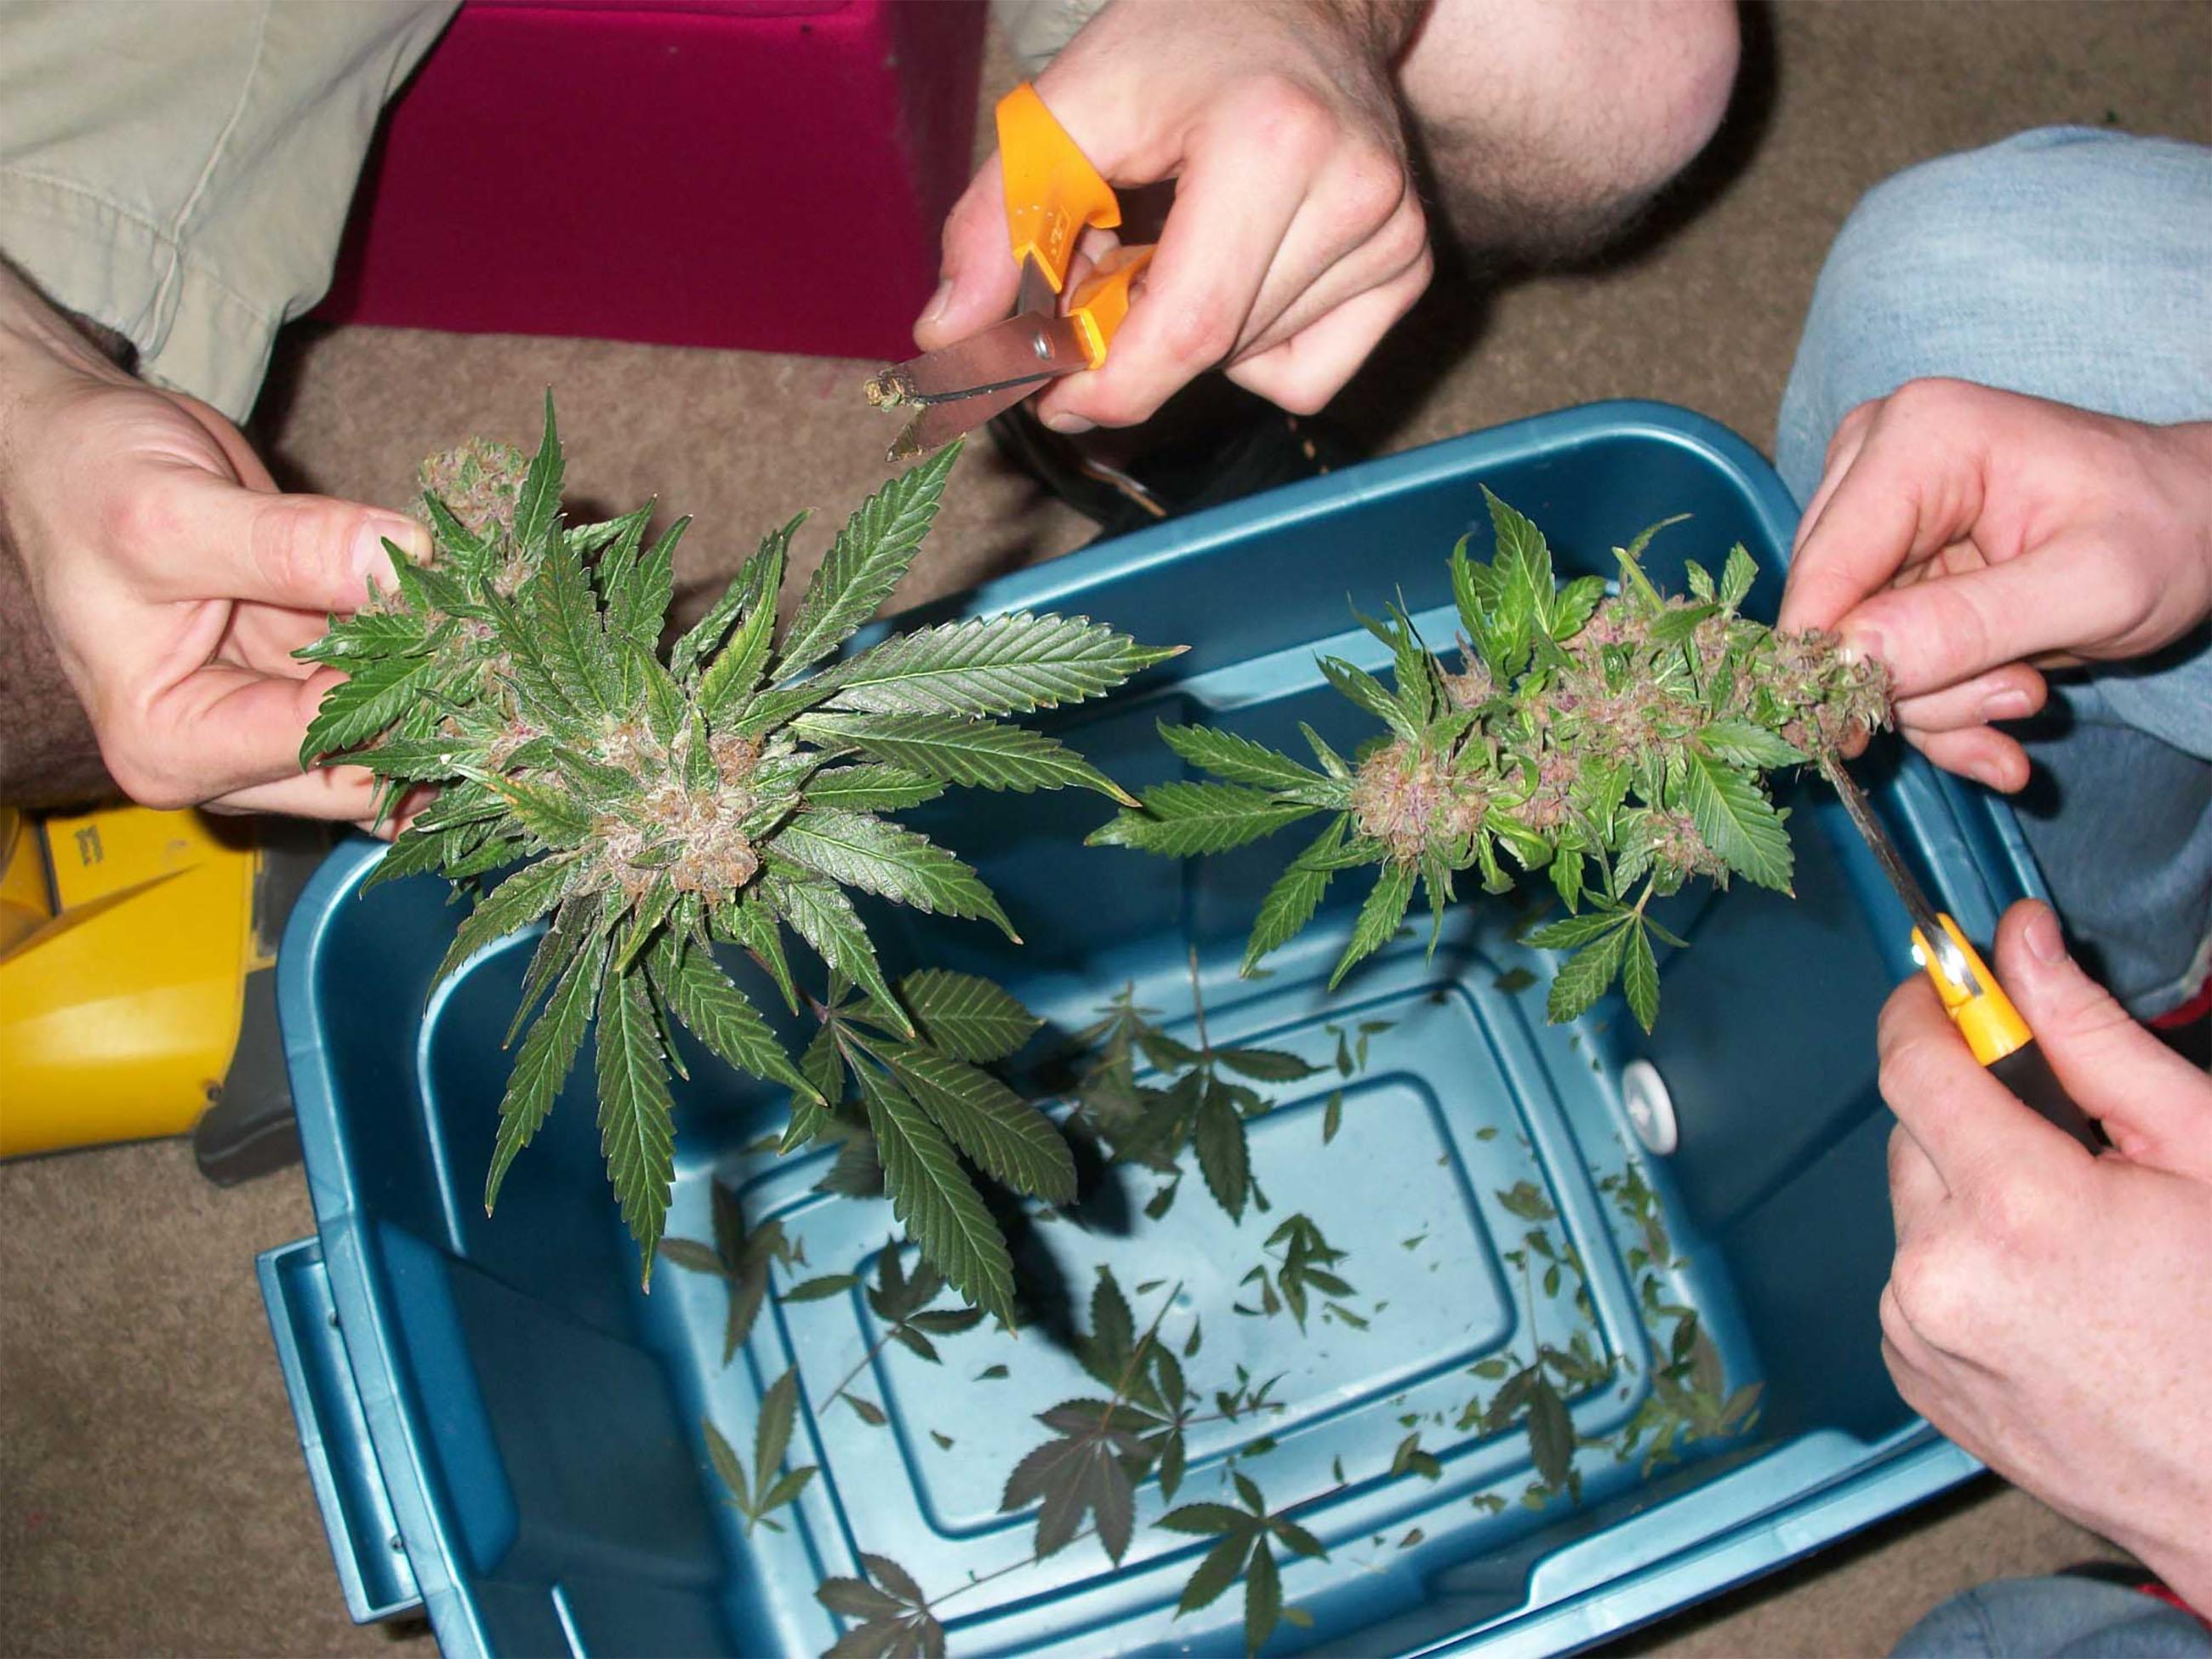 C mo podar y hacer la manicura a los cogollos de cannabis - Faut il couper les fleurs fanees des hortensias ...